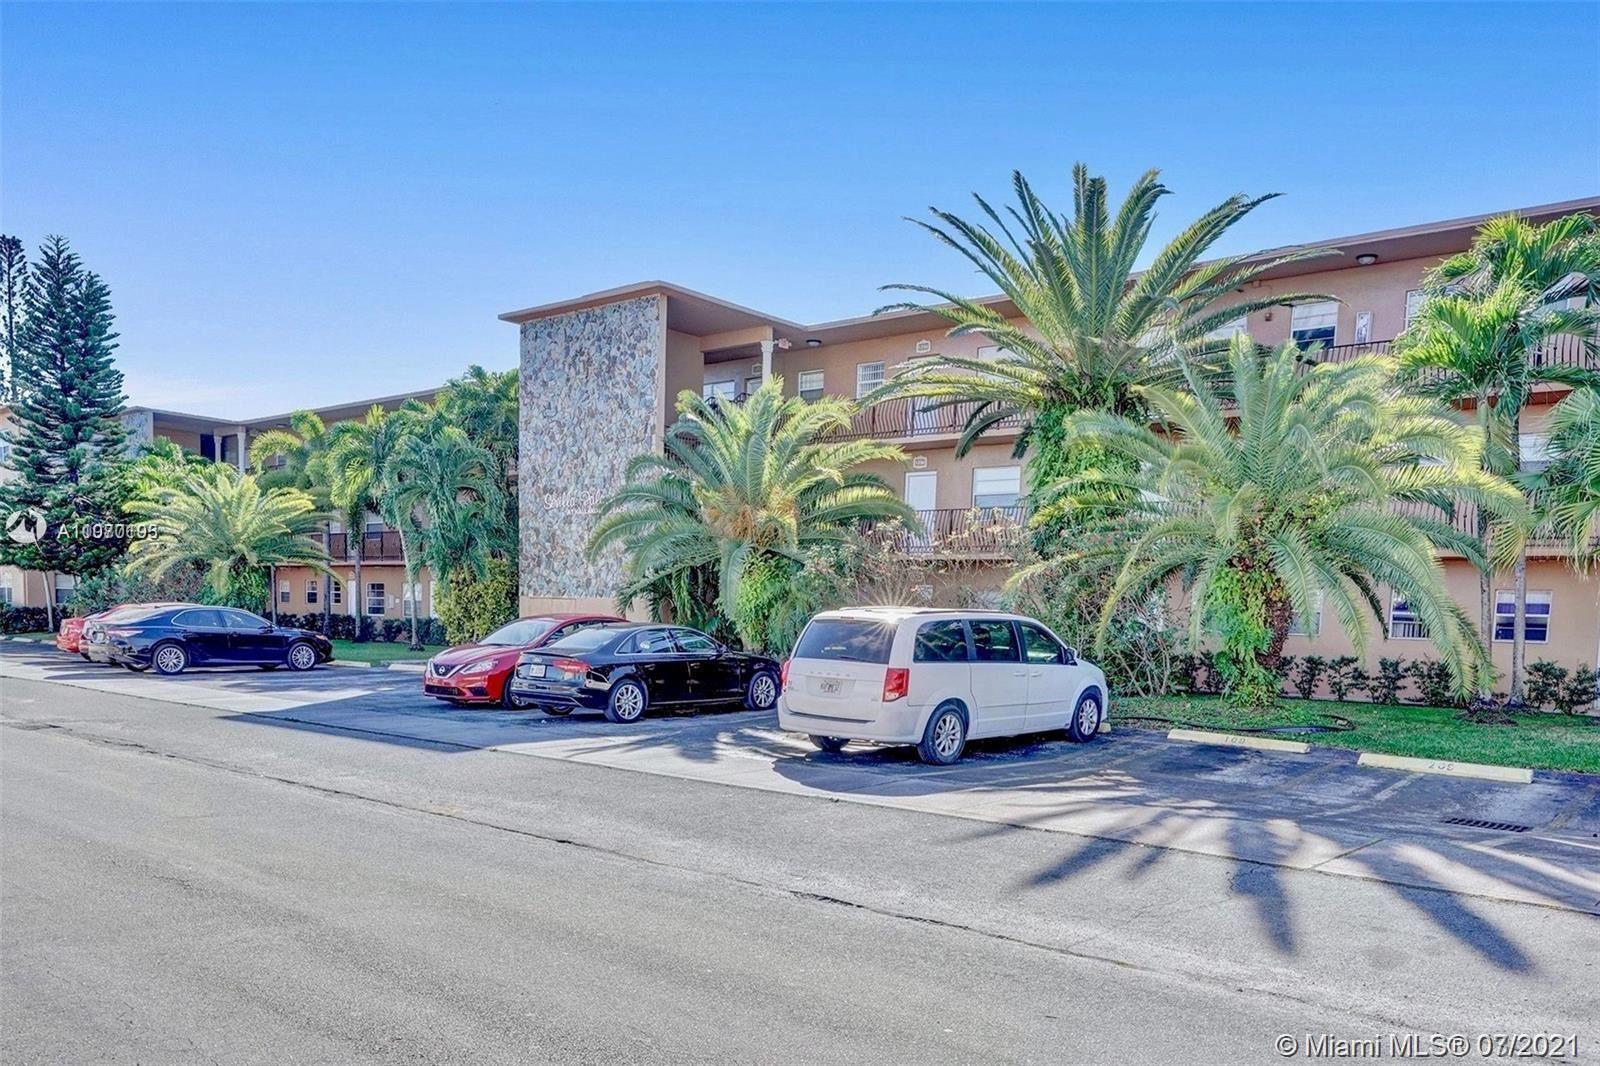 110 SE 2nd St #306, Hallandale Beach, FL 33009 - #: A11070193